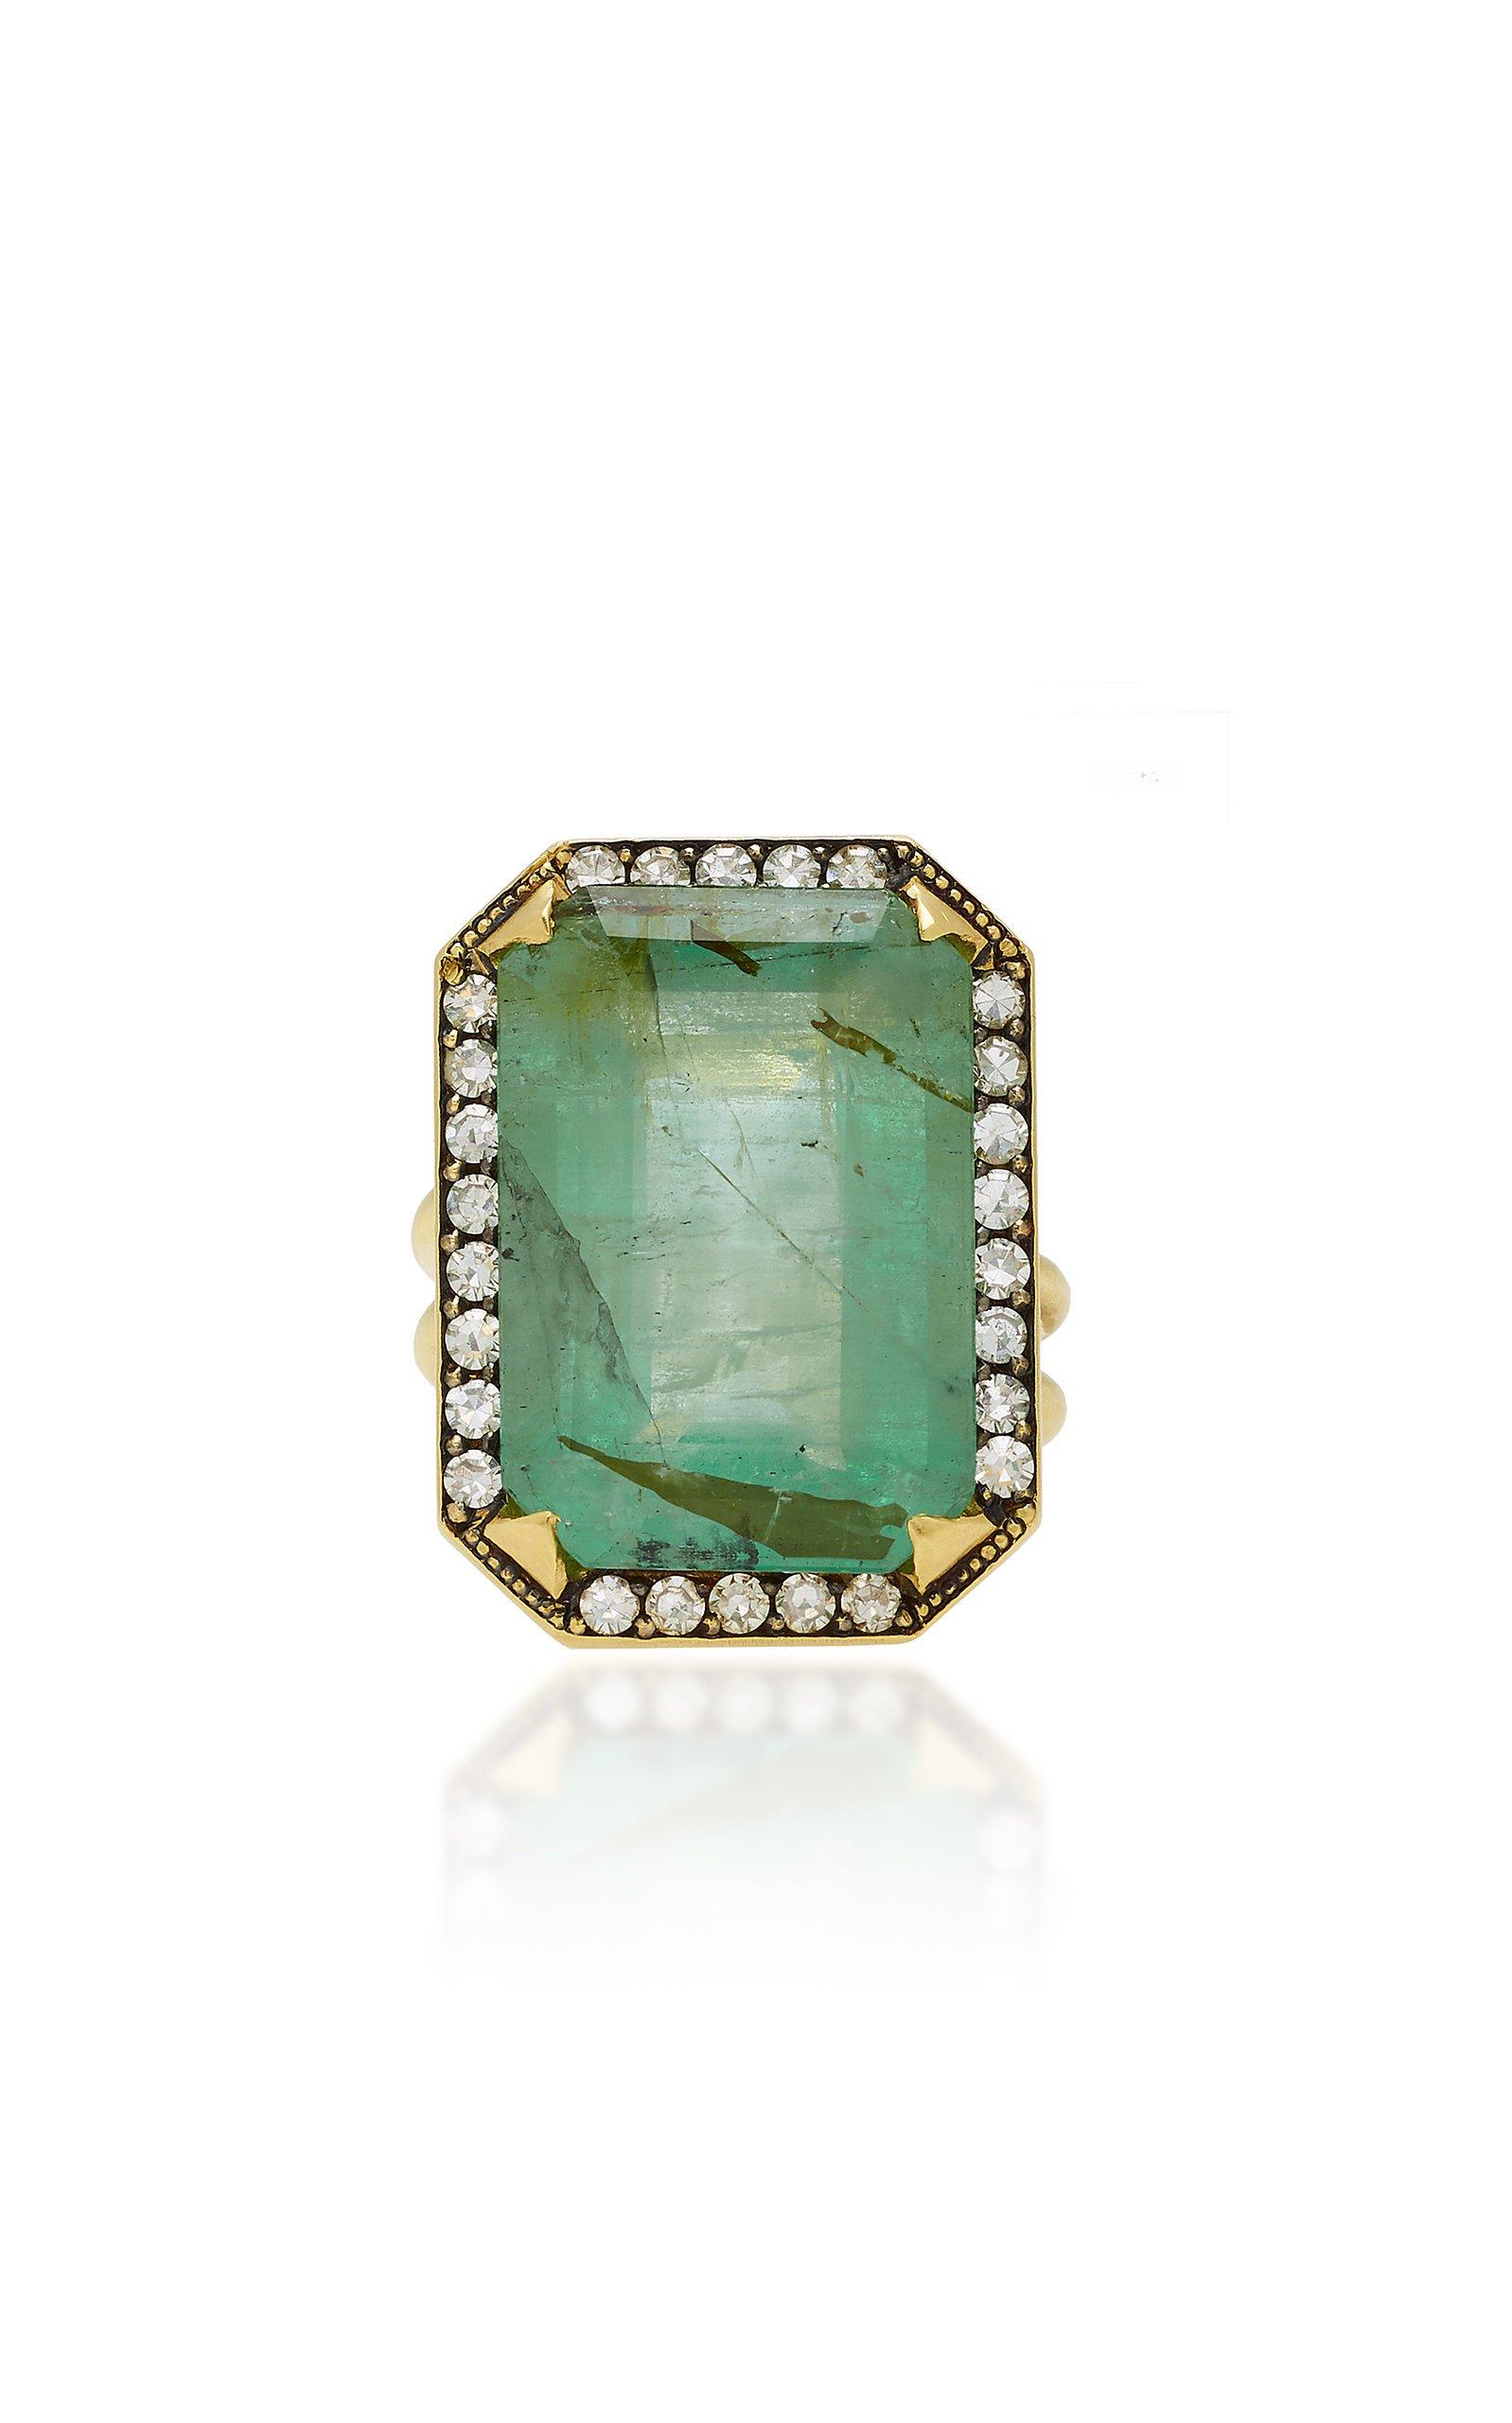 18K Gold, Emerald And Diamond Ring by Sylva & Cie   Moda Operandi